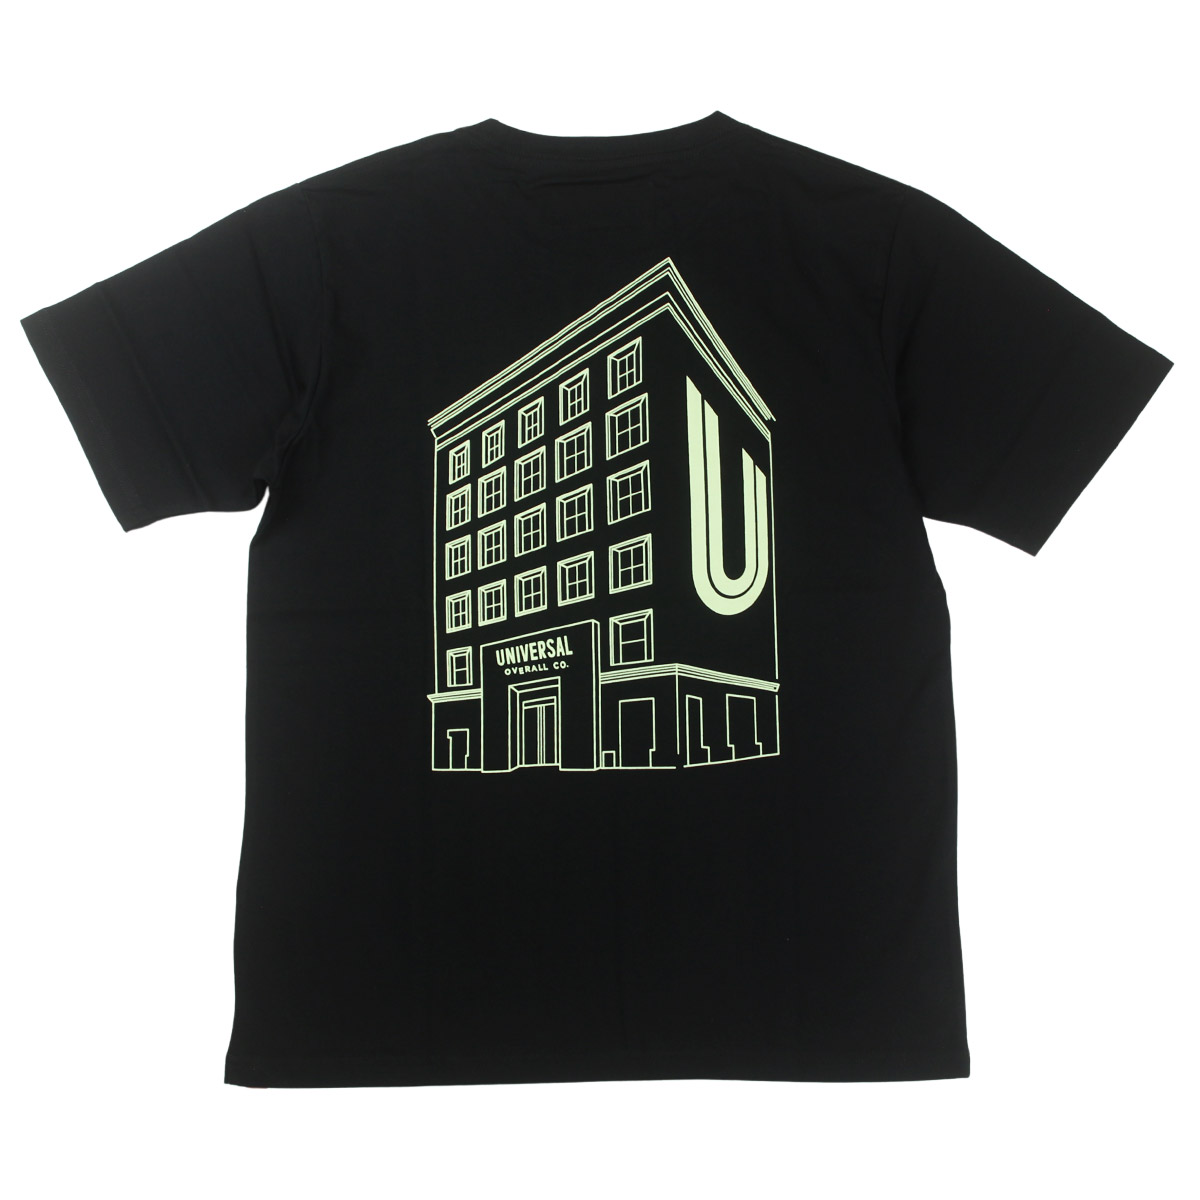 UNIVERSAL OVERALL ユニバーサルオーバーオール CHICAGO HEAD OFFICE